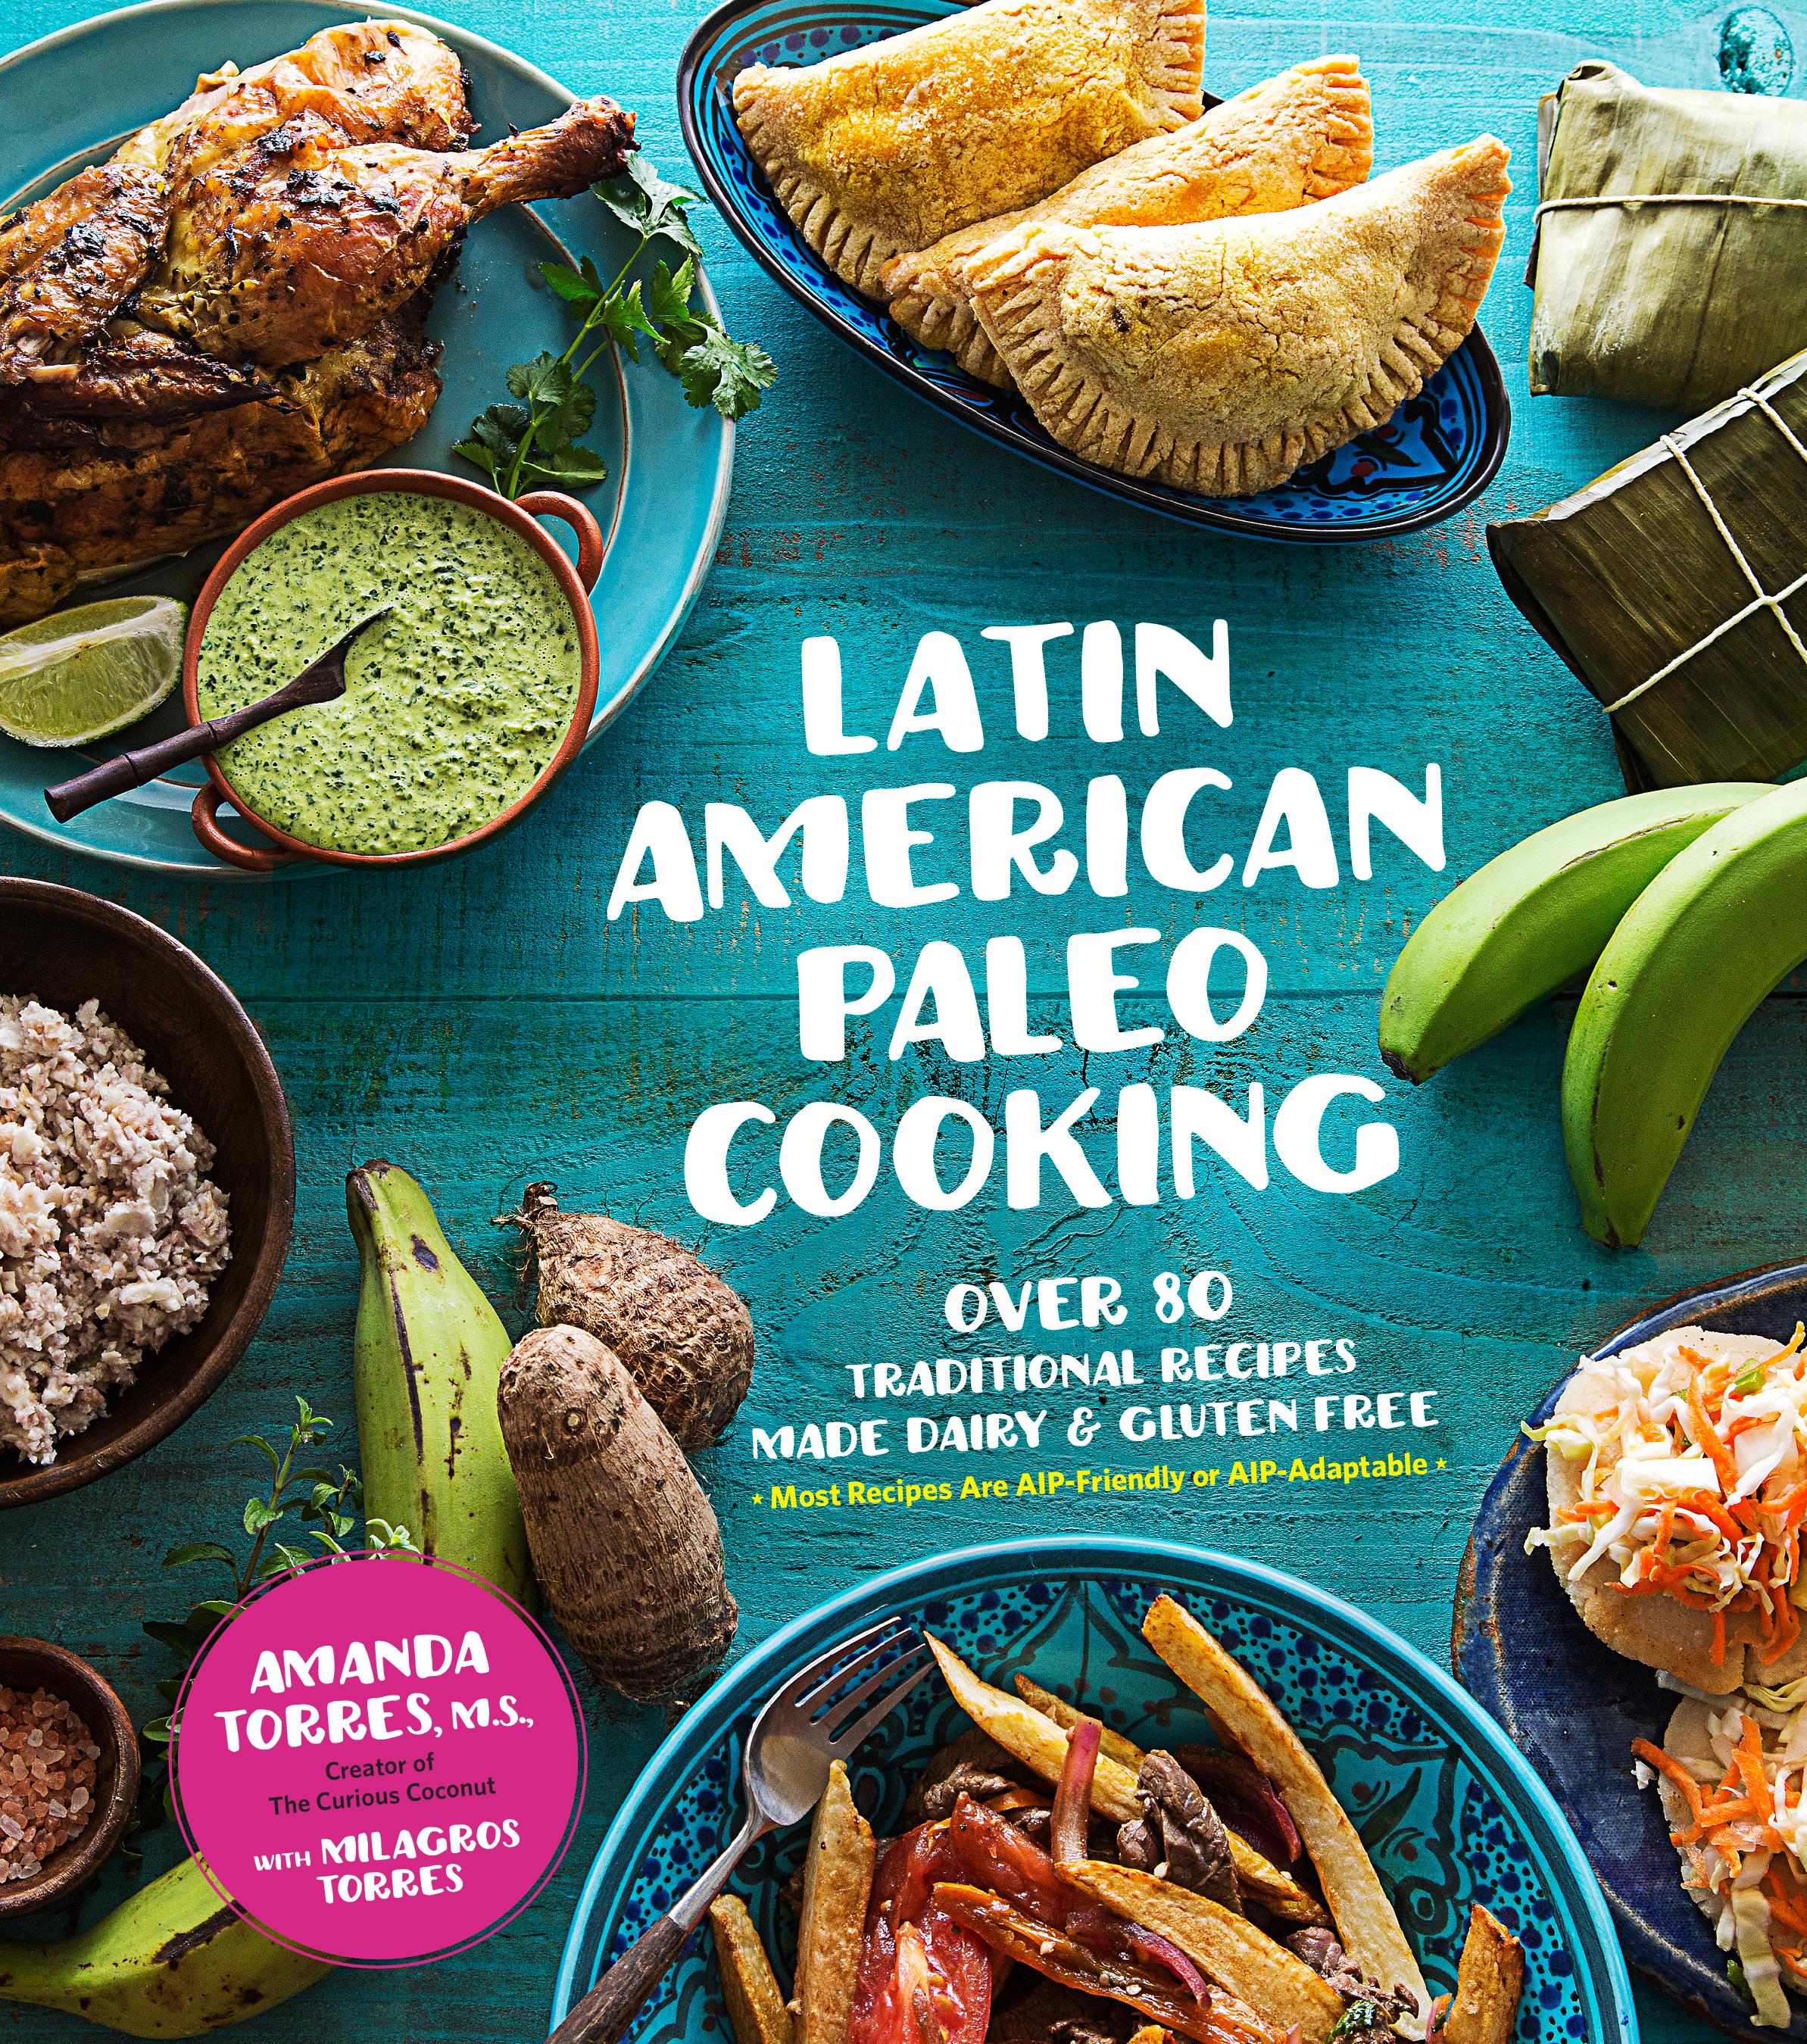 Amanda's amazing new cookbook!